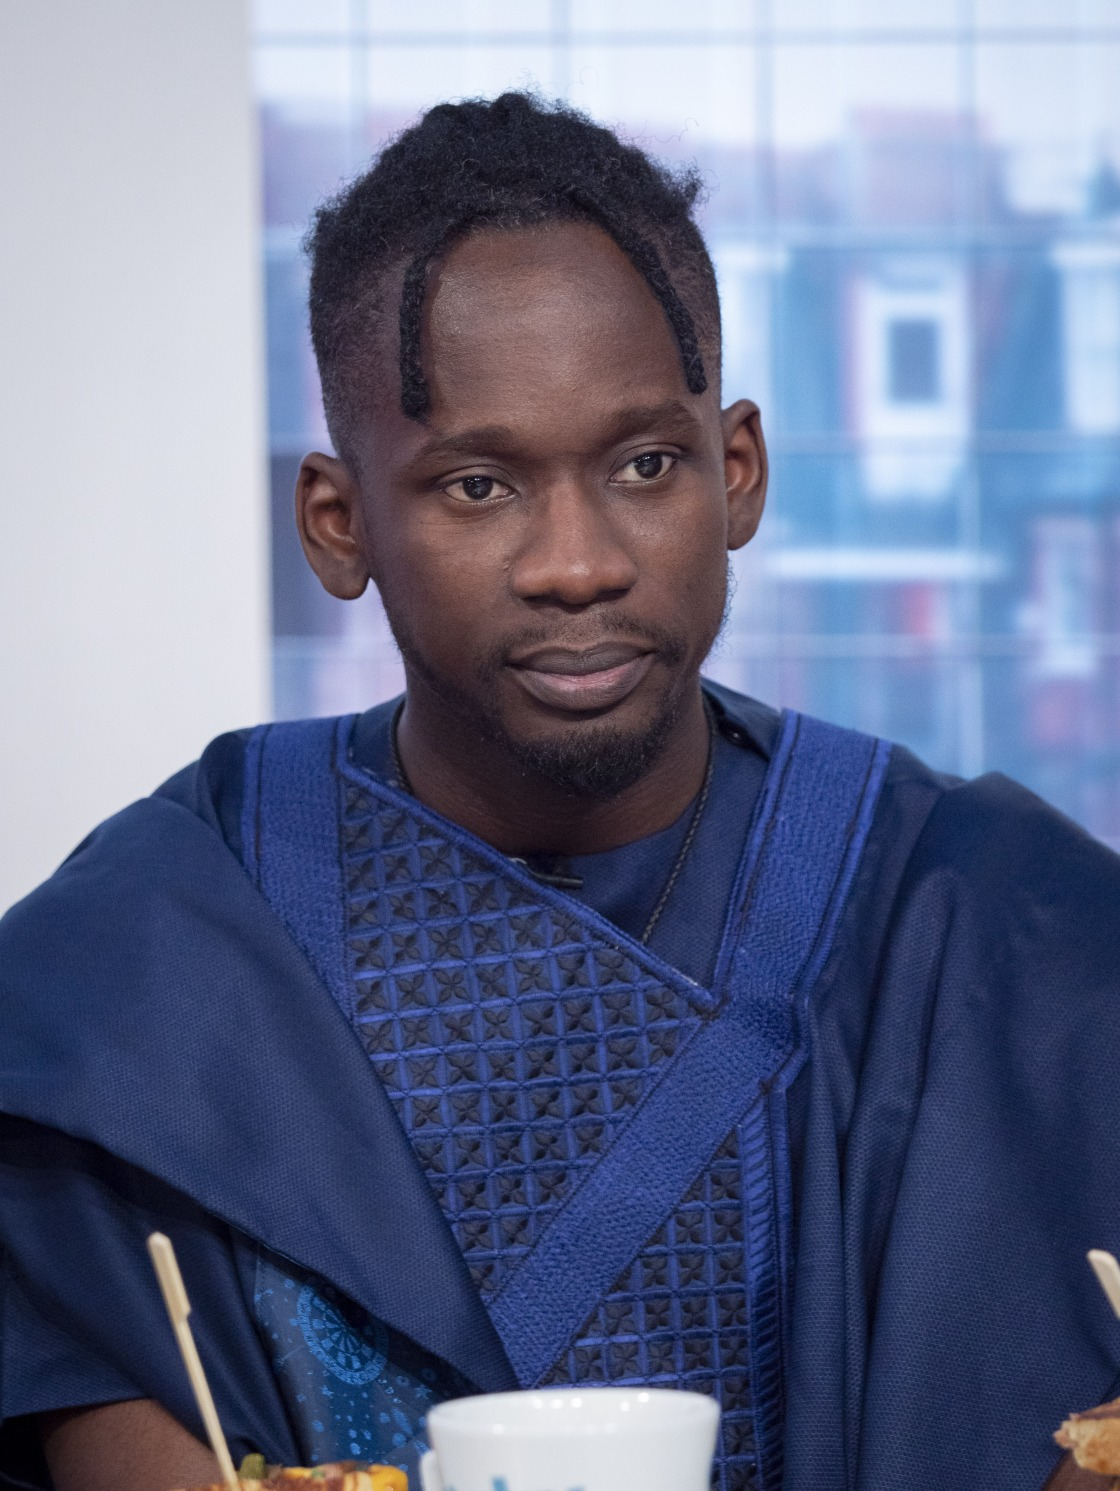 Nigerian star, Mr. Eazi raises $20 million to invest in African music creatives